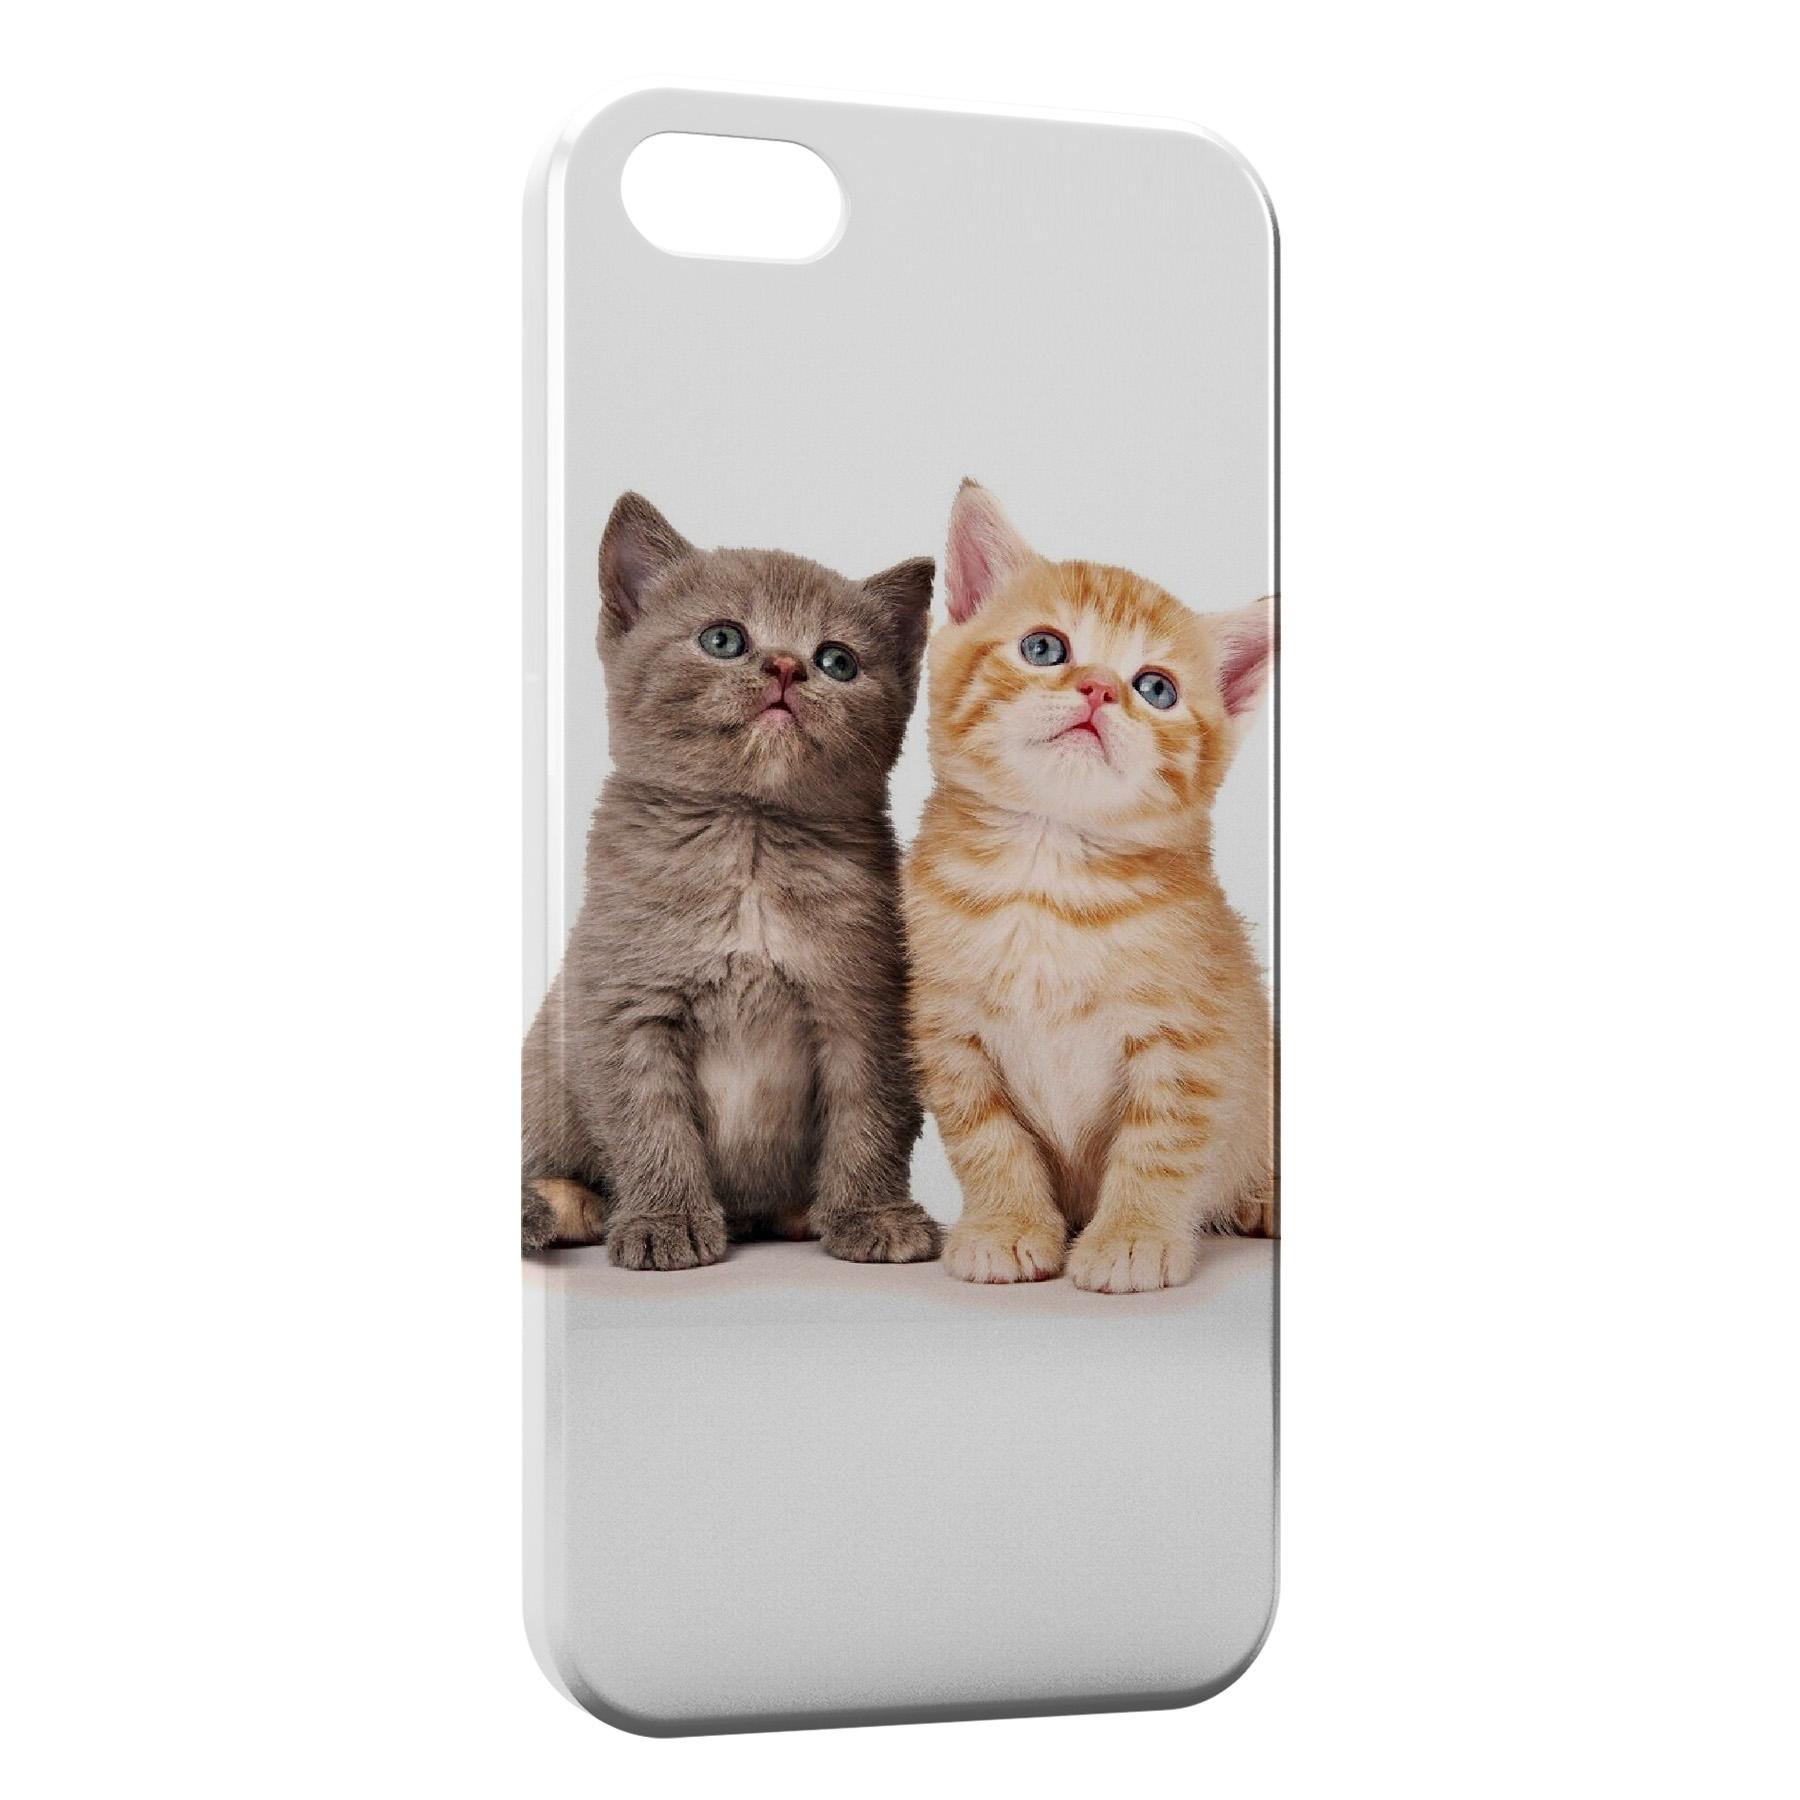 Coque iPhone 7 7 Plus 2 Chats Mignons